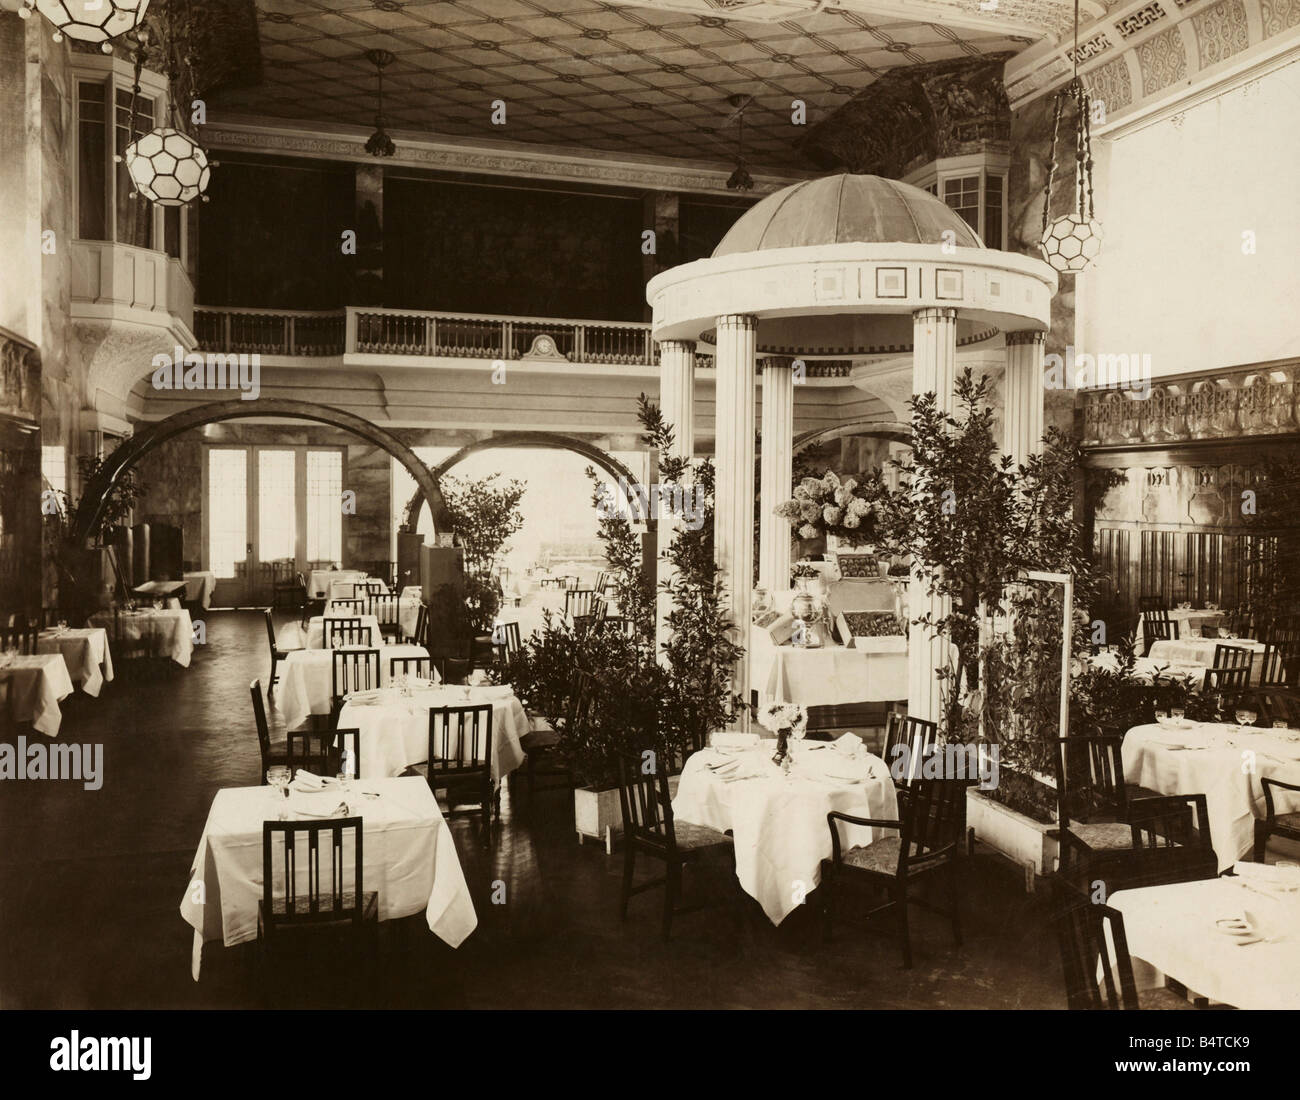 geography / travel, Germany, Munich, gastronomy, 'Four Seasons' hotel, interior view, Cherubin palace, built - Stock Image